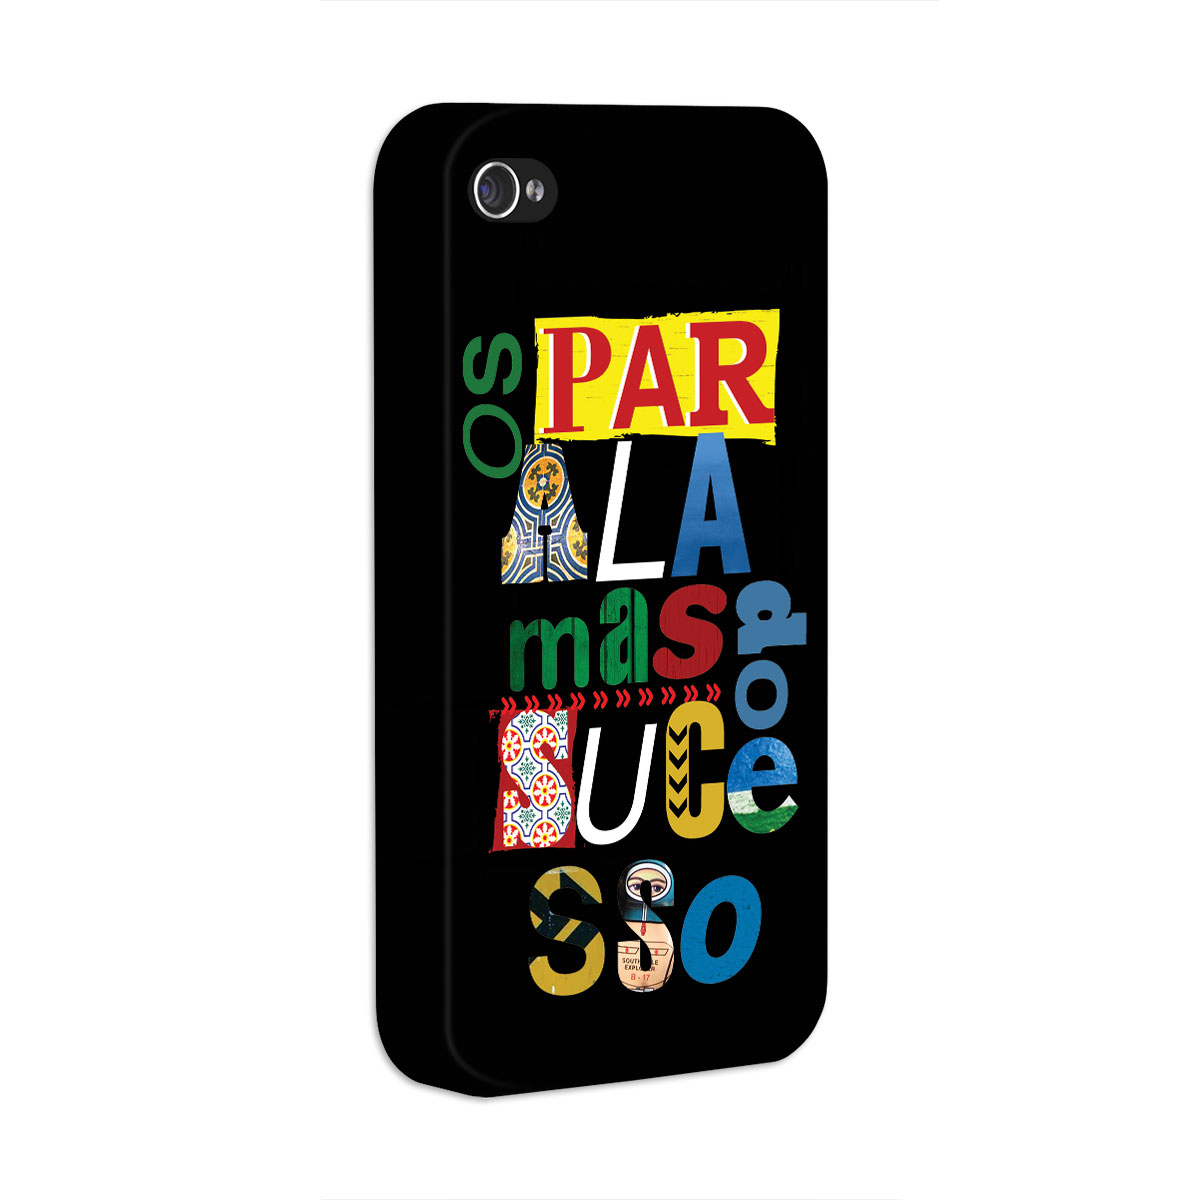 Capa de iPhone 4/4S Os Paralamas do Sucesso Type